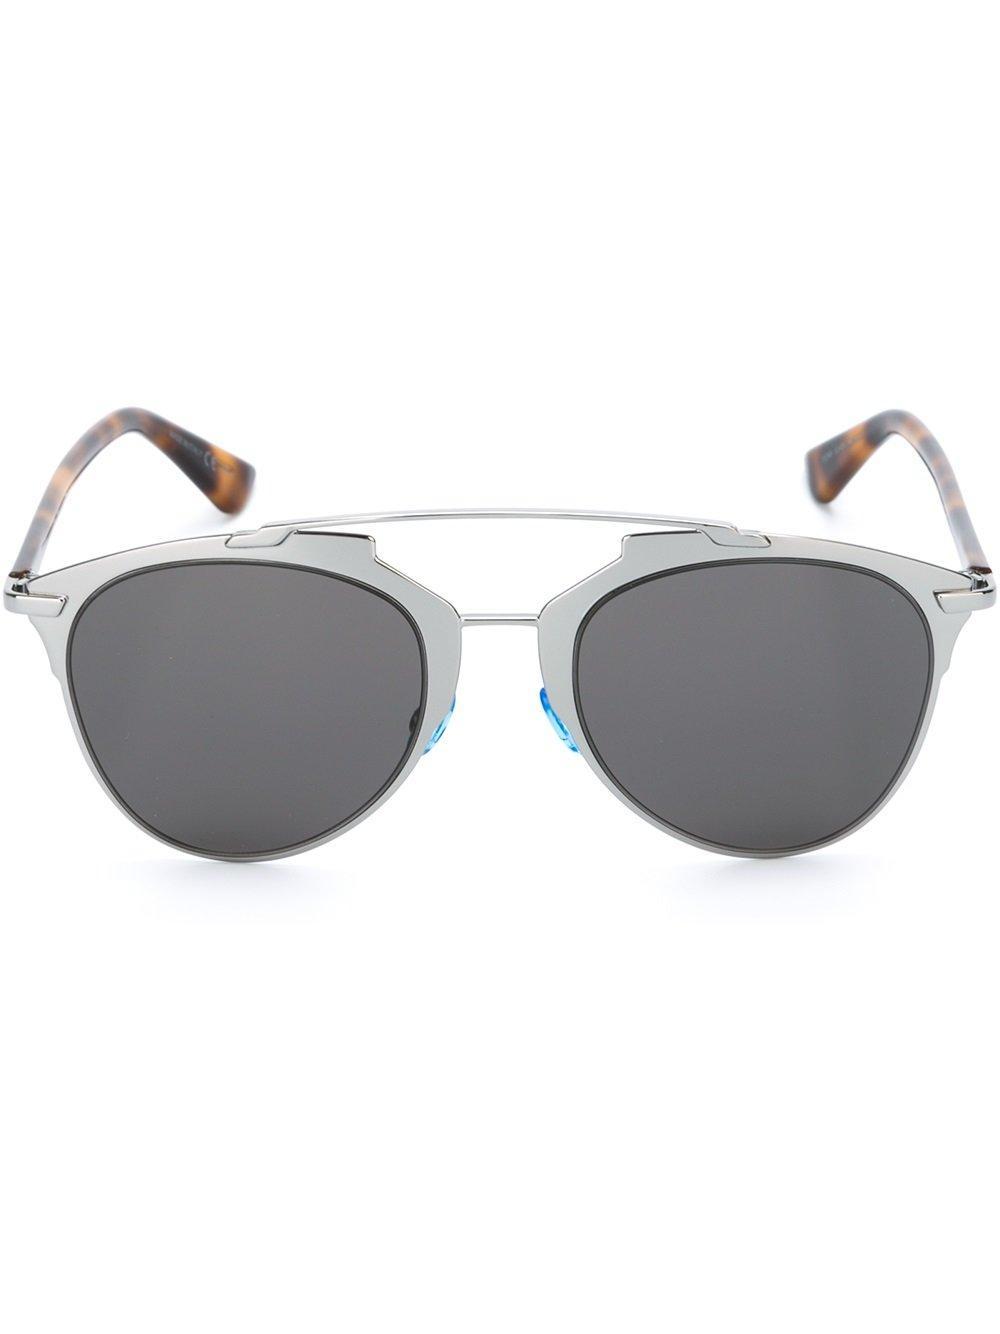 Dior 'reflected' Sunglasses In Metallic